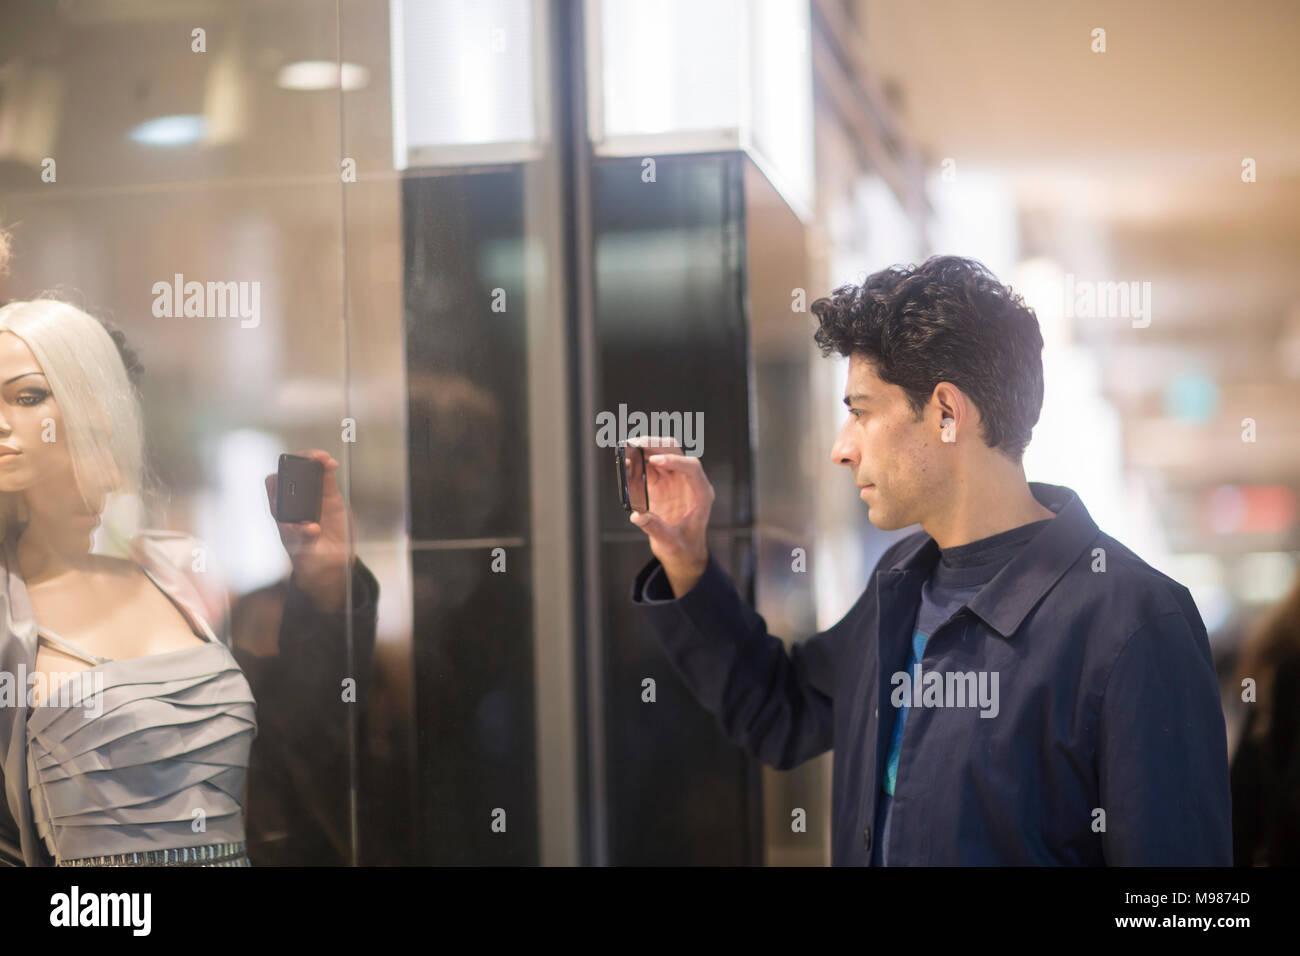 El hombre toma de fotografía de pantalla maniquí con teléfono celular Imagen De Stock